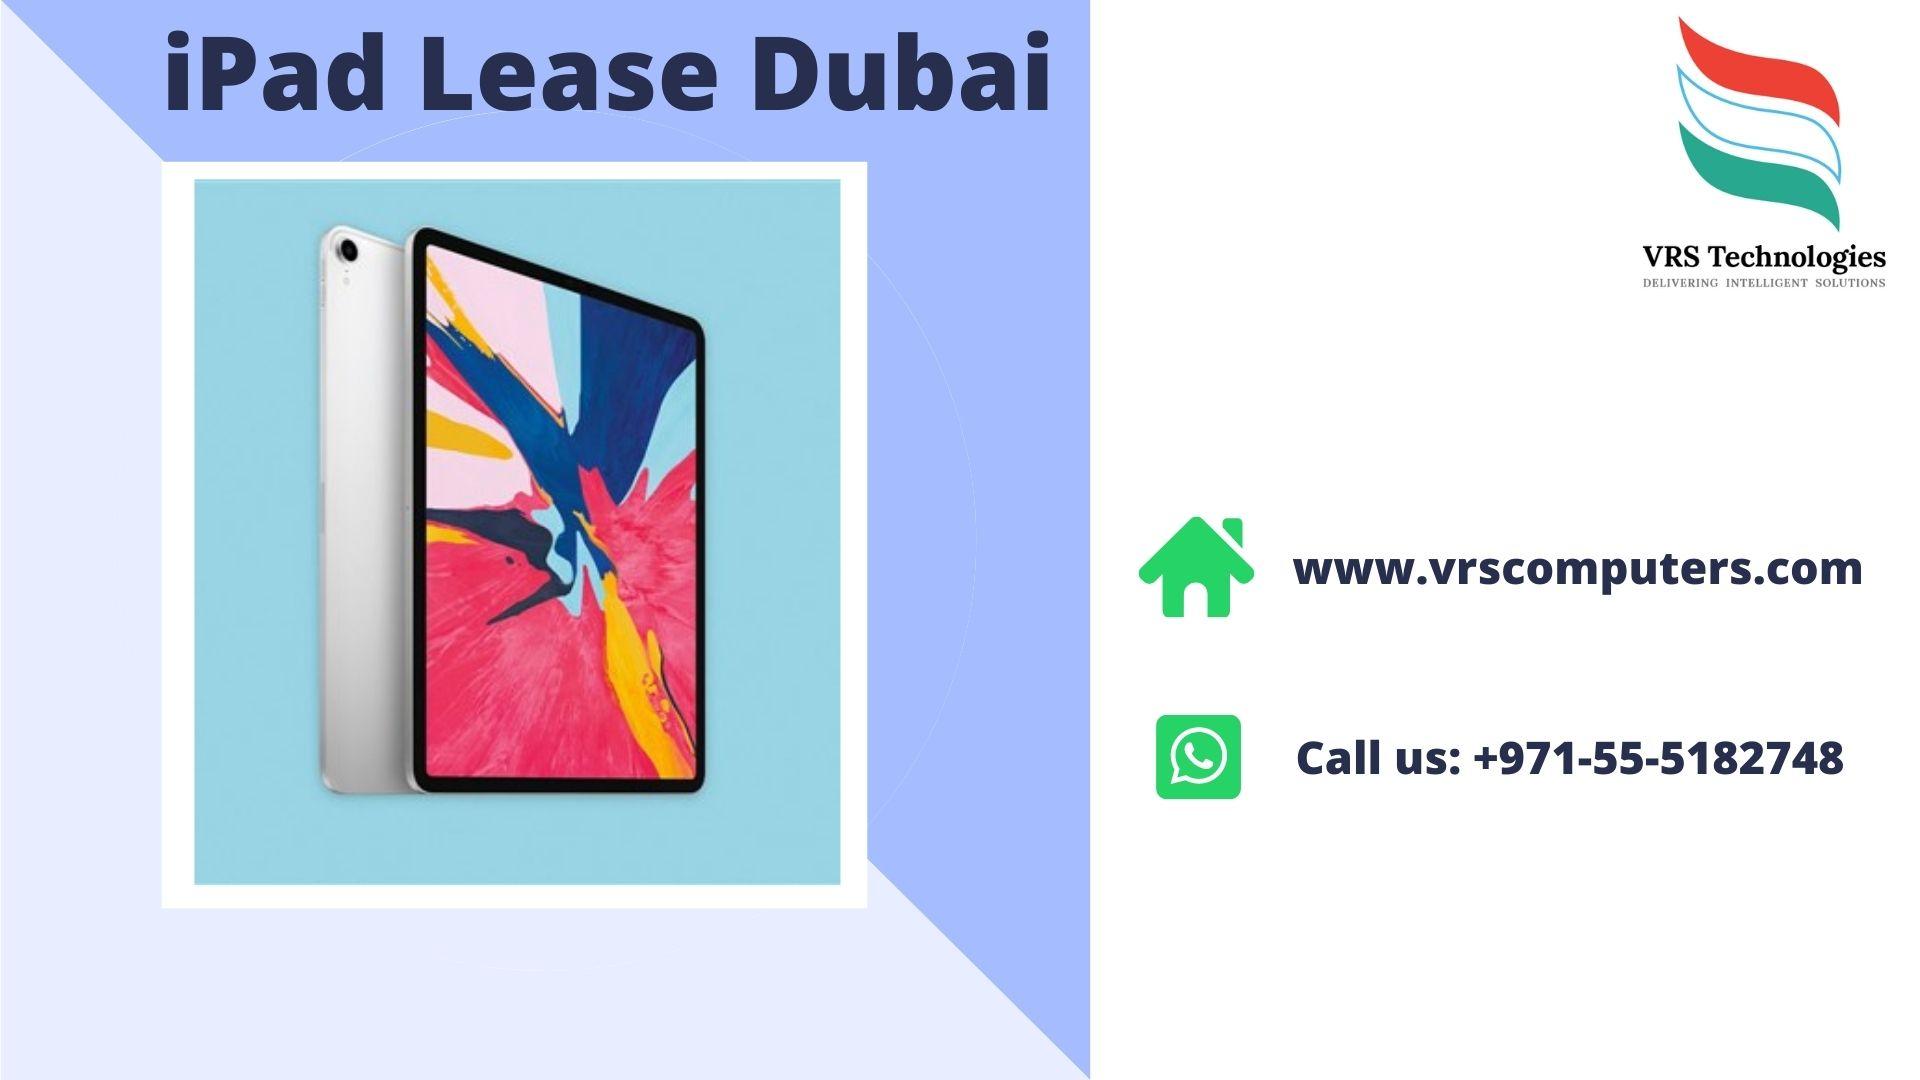 iPad-Lease-Dubai.jpg